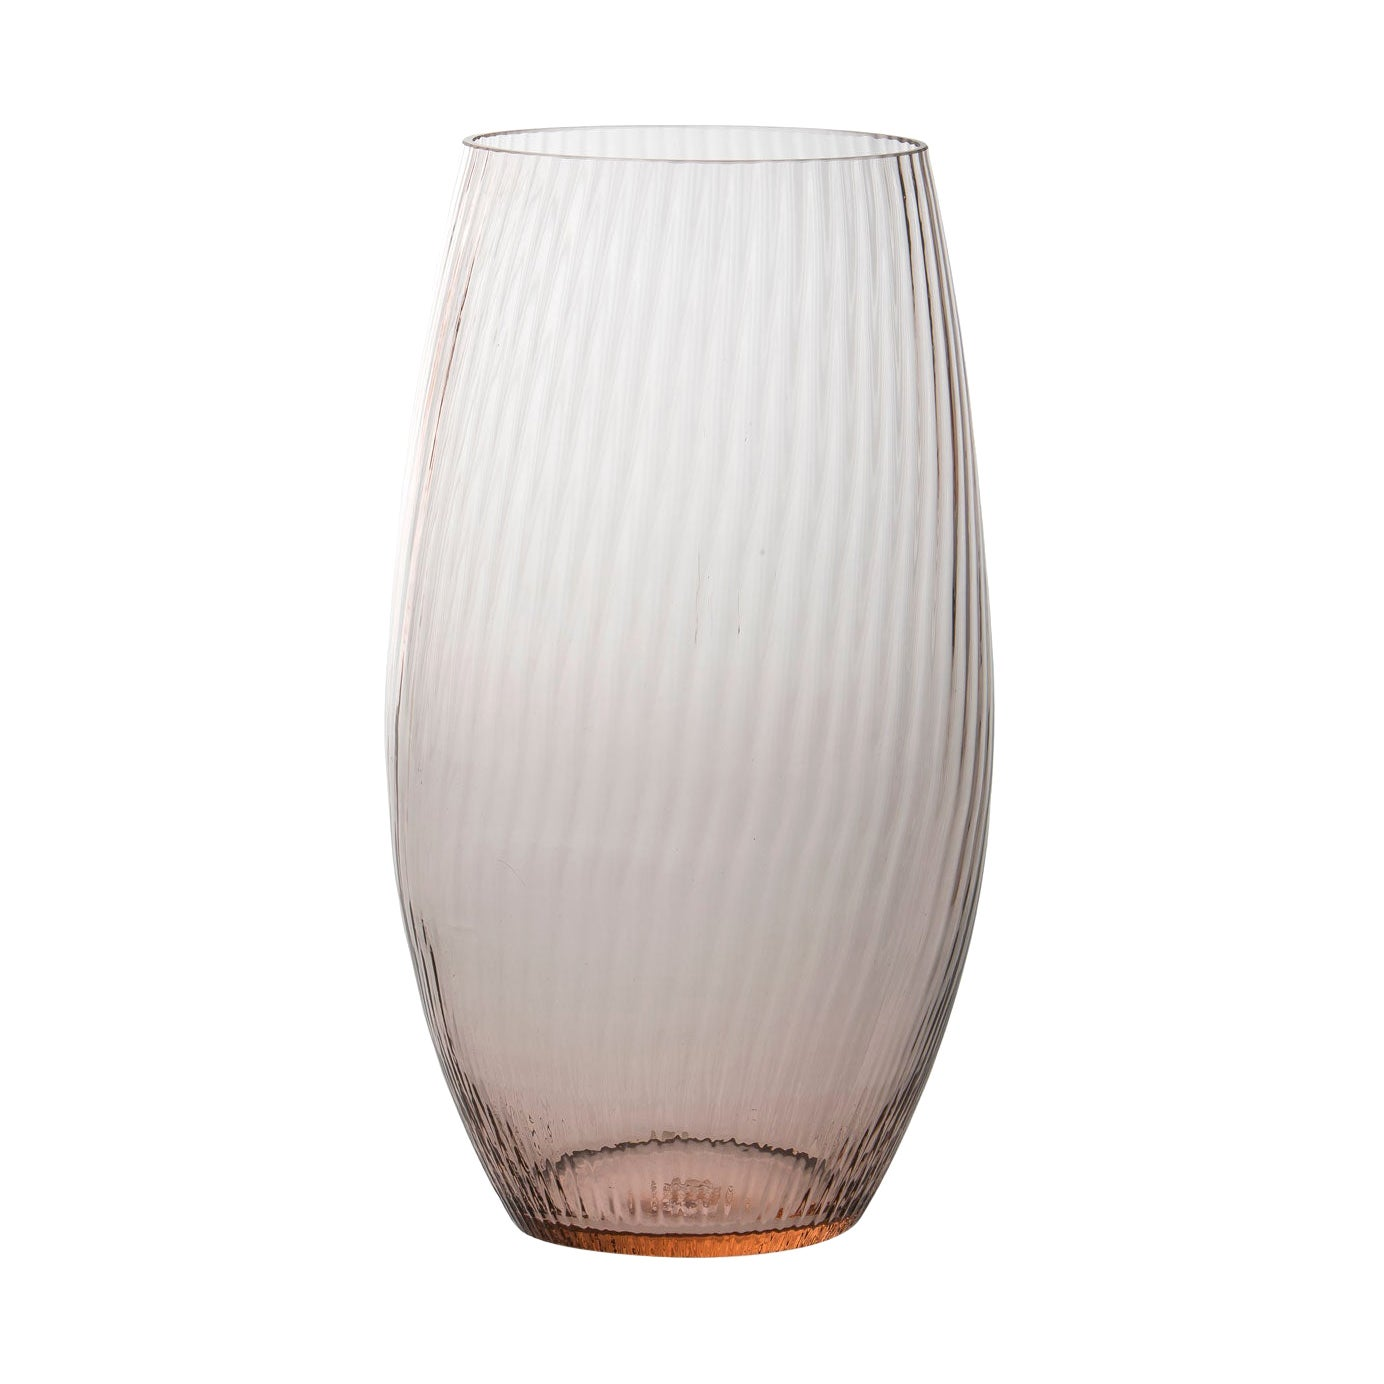 Vaso Ovale28, Vase Handcrafted Muranese Glass, Rose Quartz Plisse MUN by VG